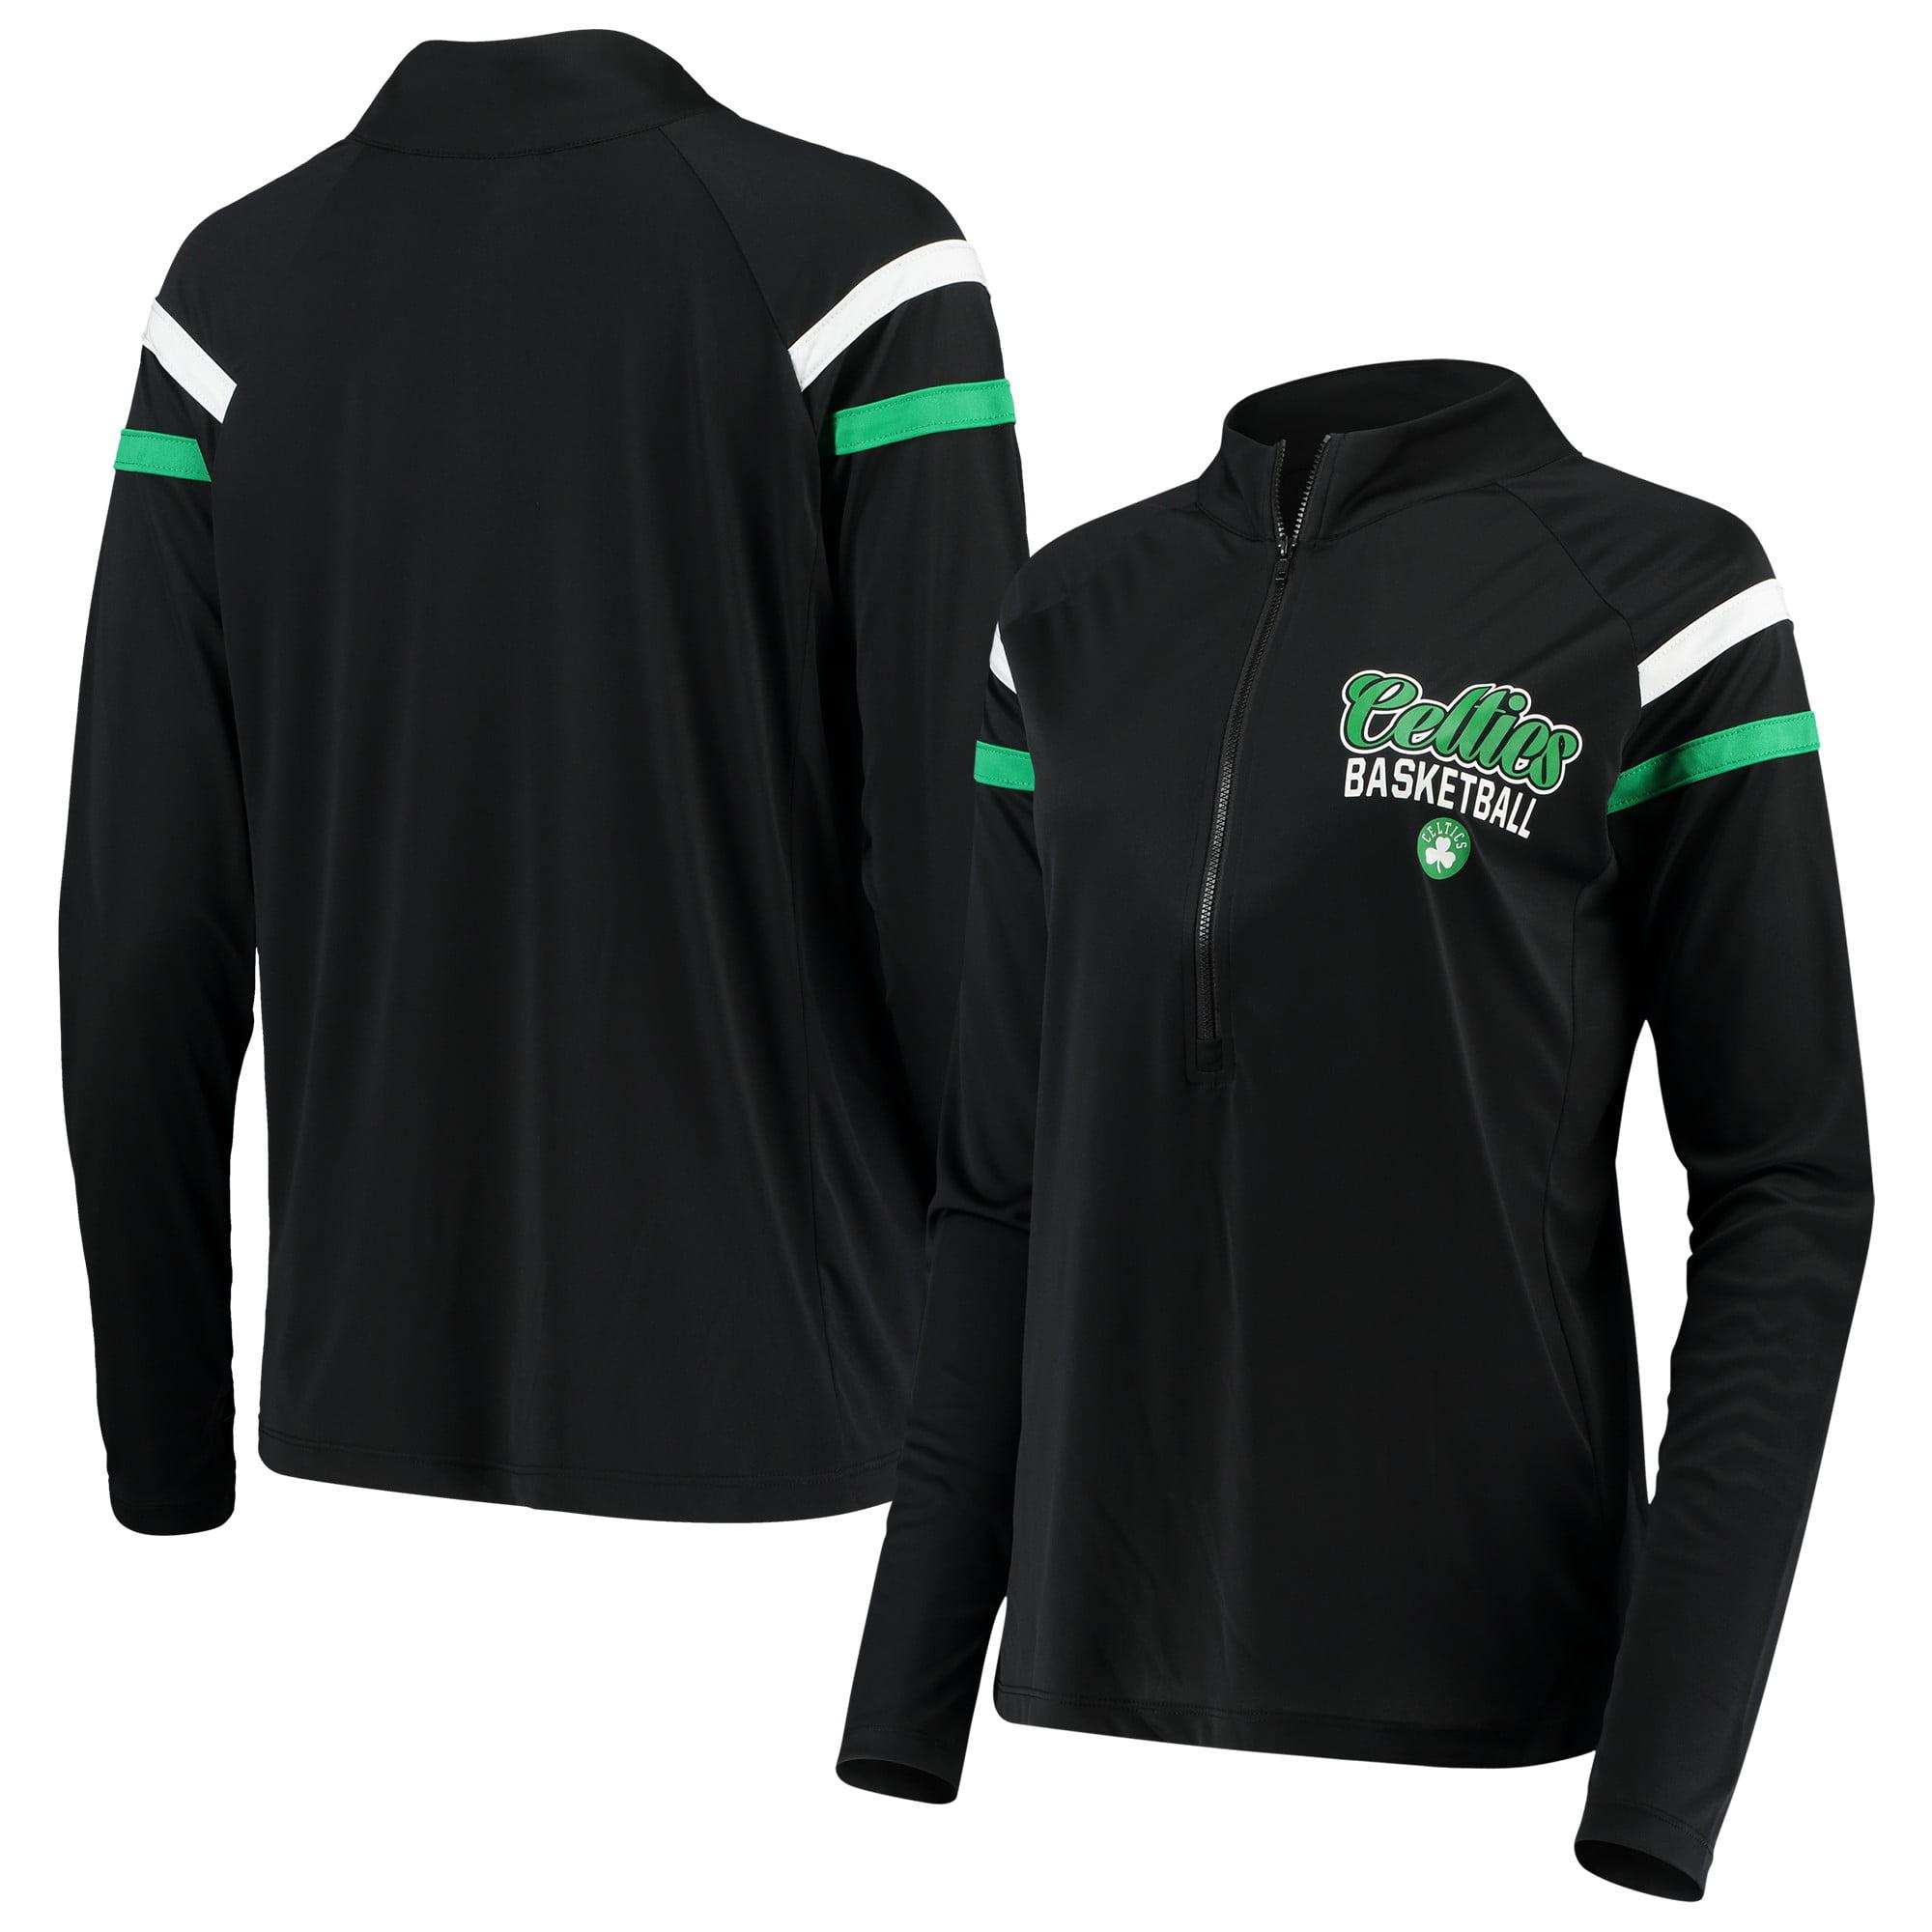 Boston Celtics 5th & Ocean by New Era Women's Pullover Half-Zip Thumb Holes Jacket - Black